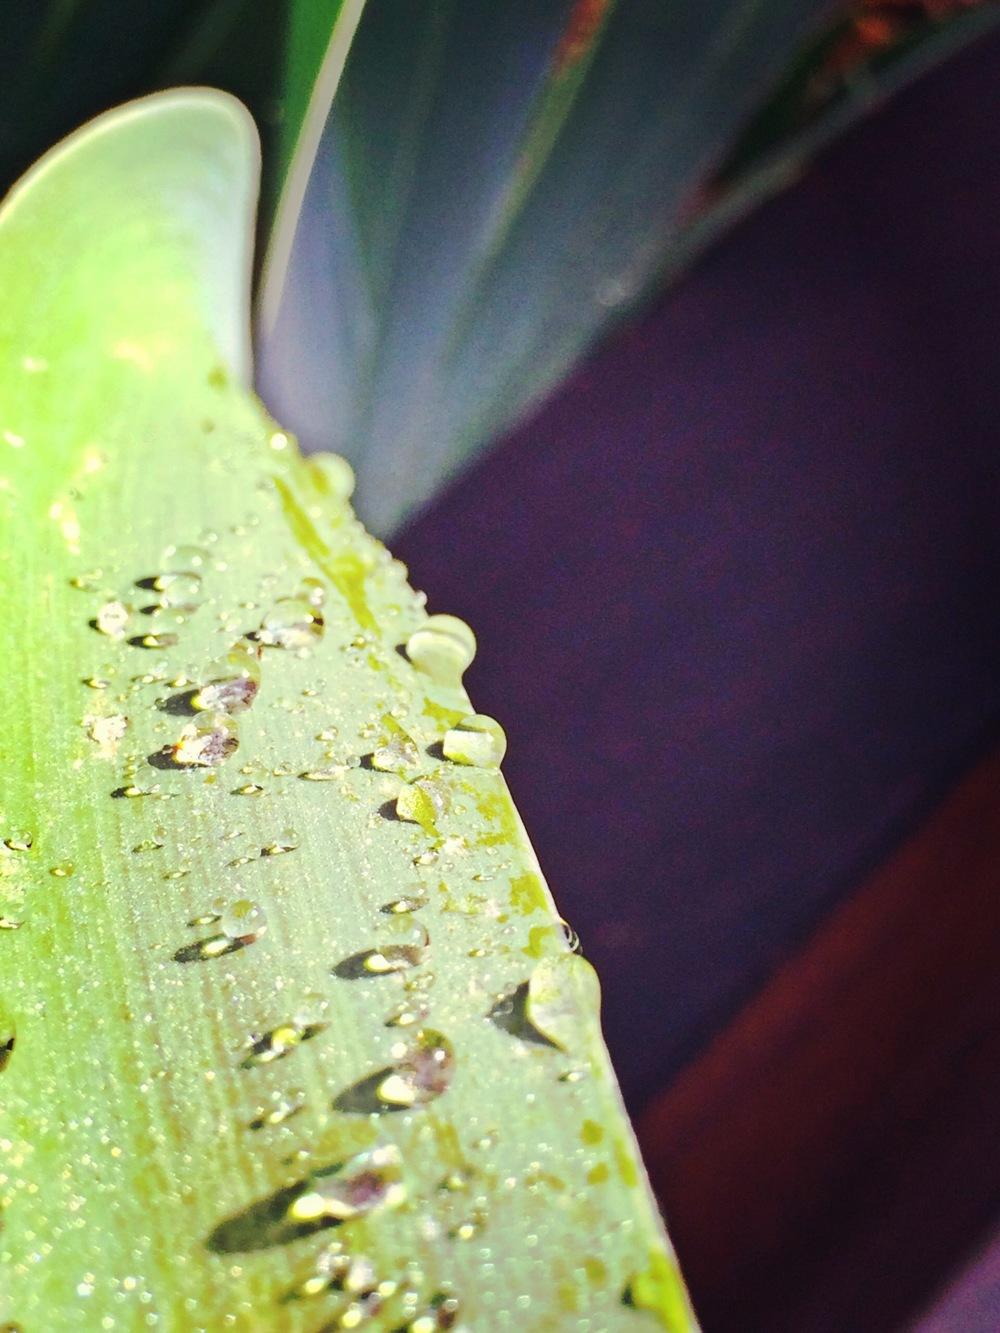 iris_droplets.JPG